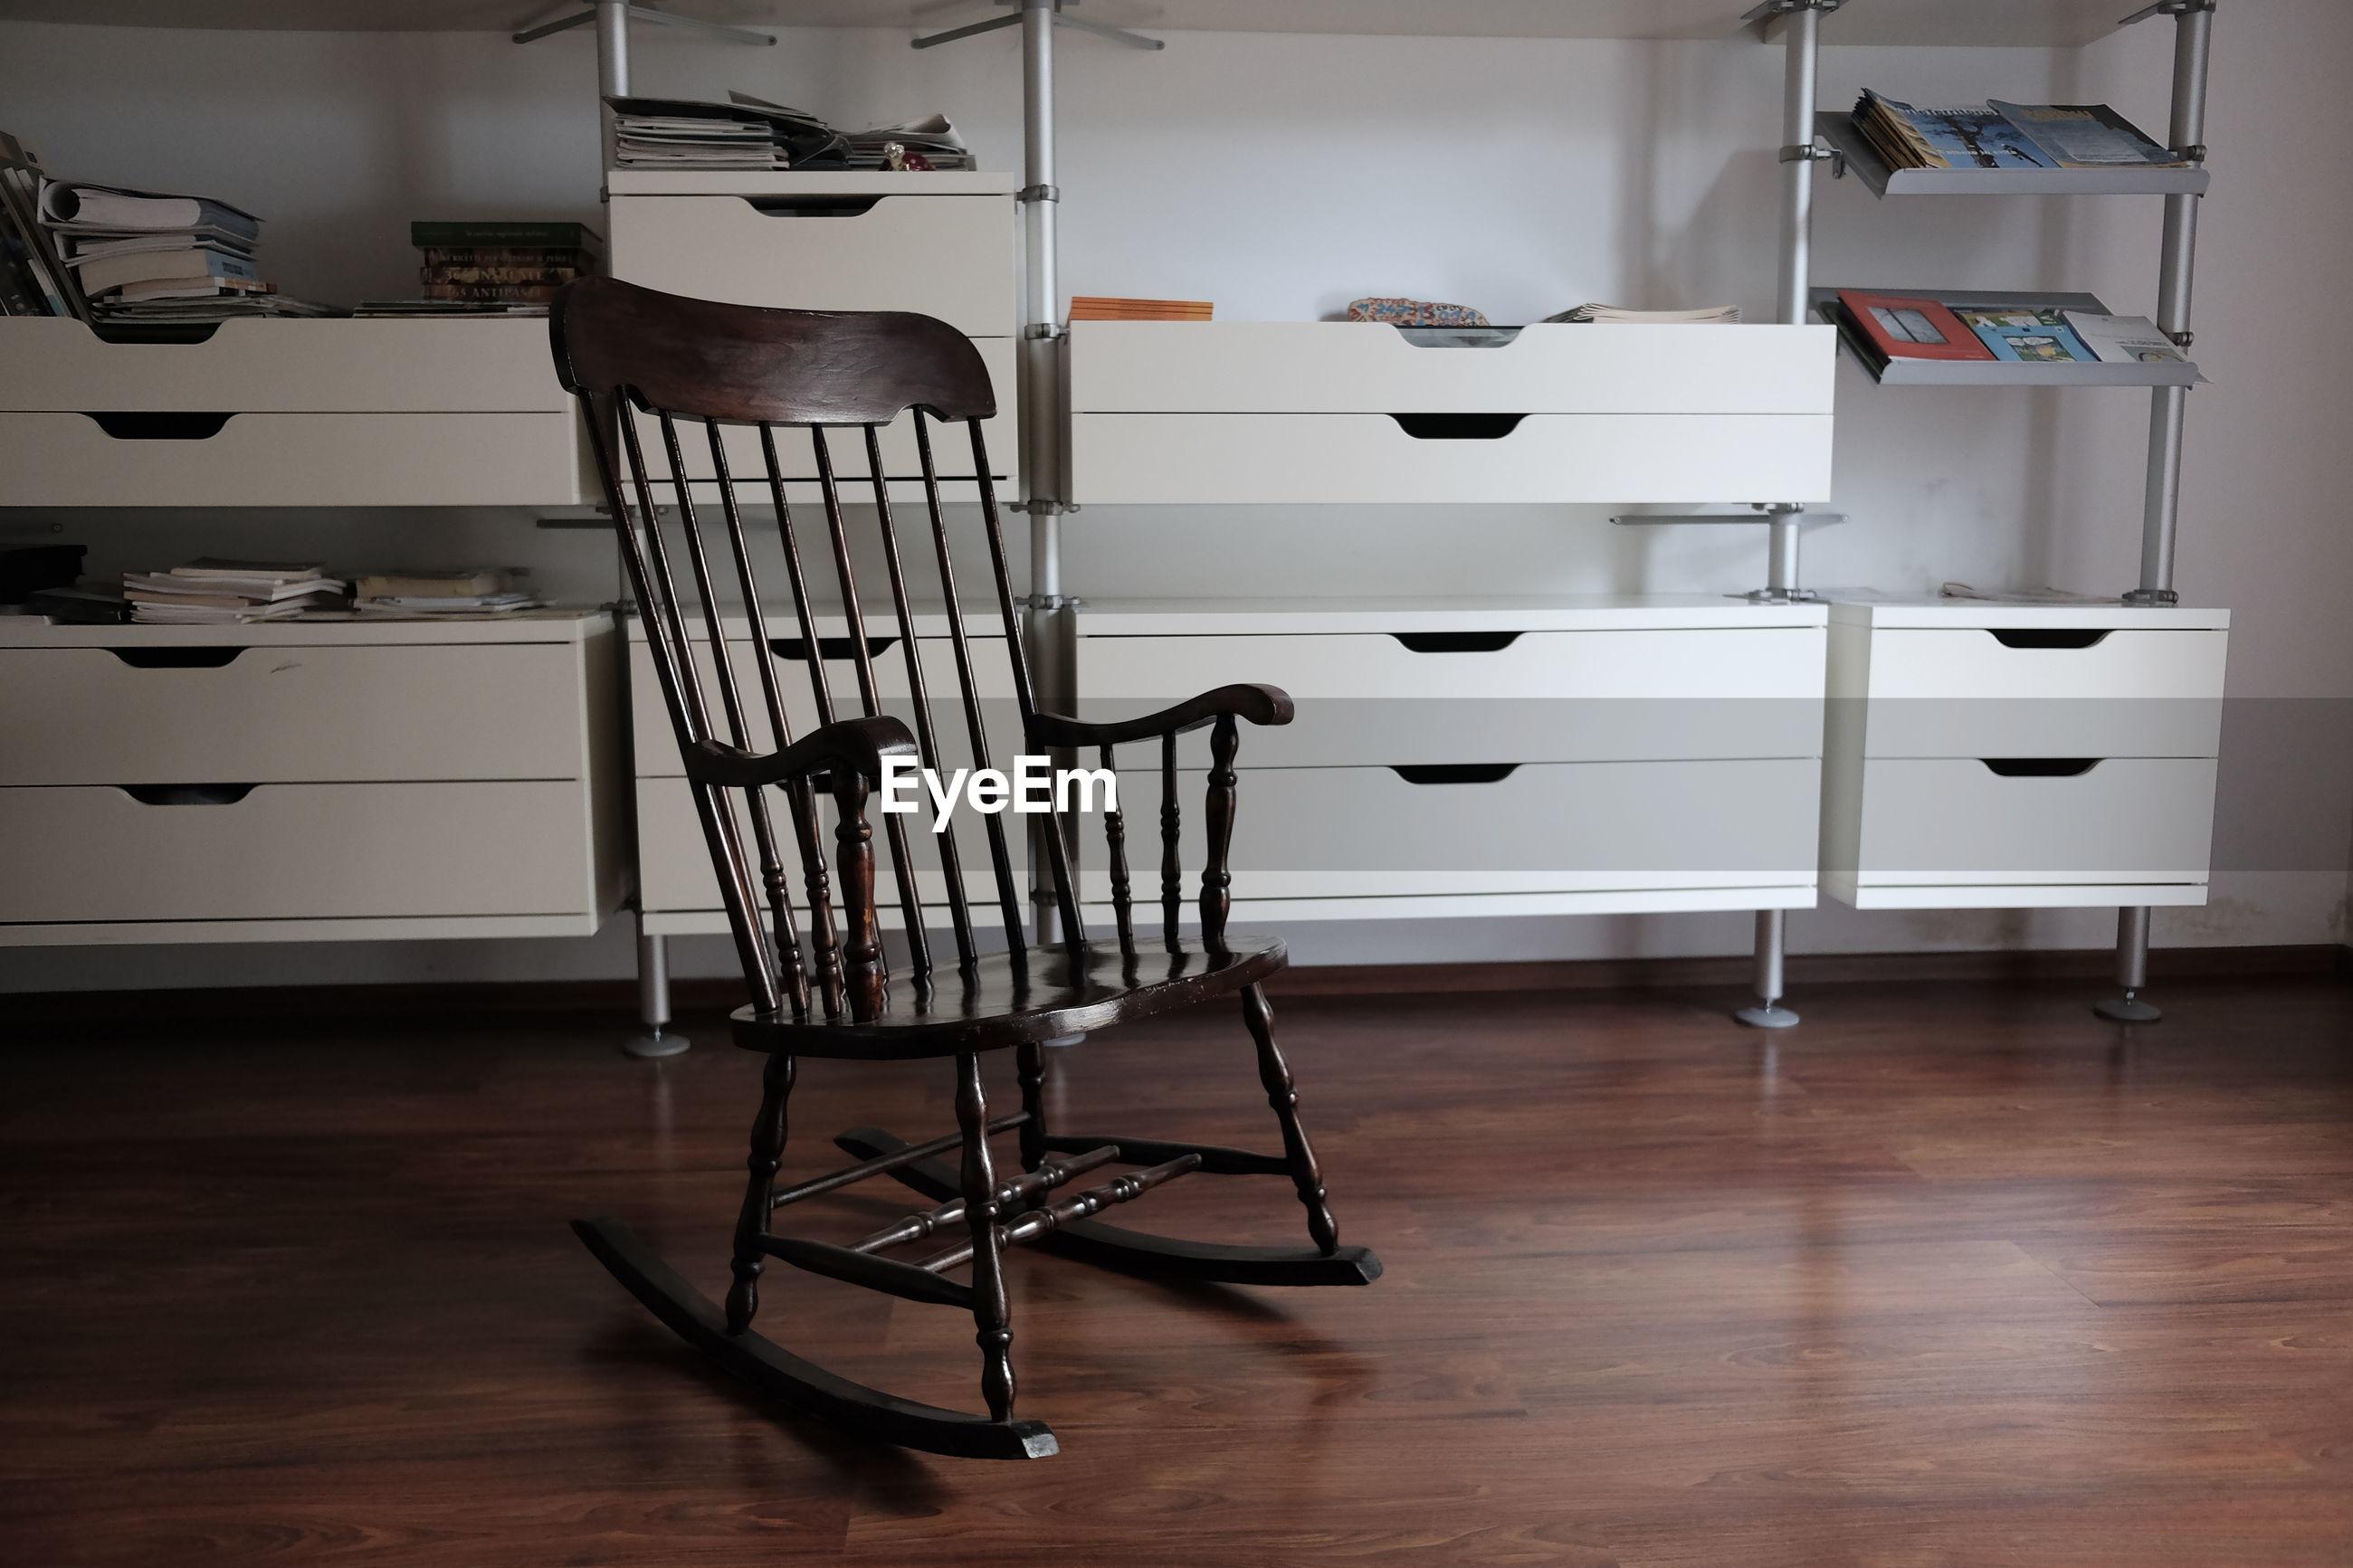 Rocking chair on hardwood floor against shelves at home